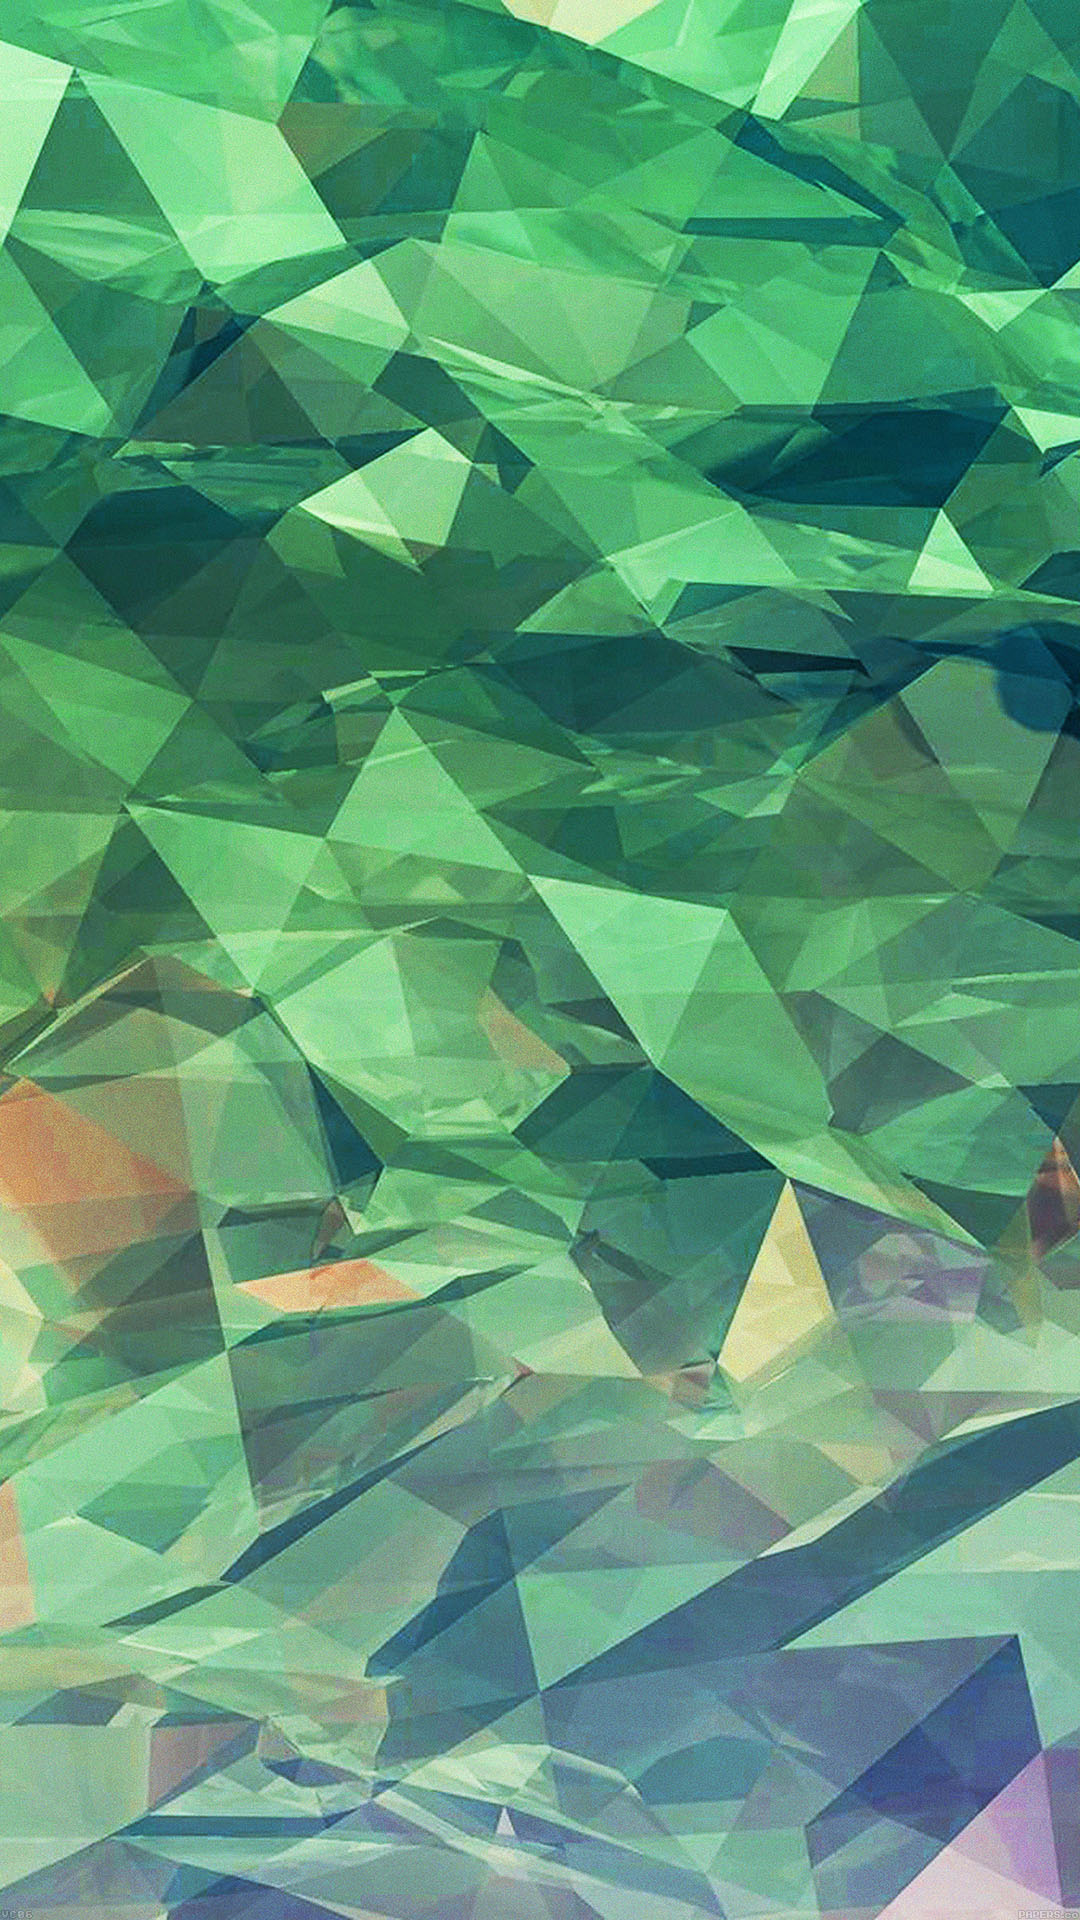 Plain Black Iphone Wallpaper Vc06 Ocean Green In Line Art Pattern Art Papers Co